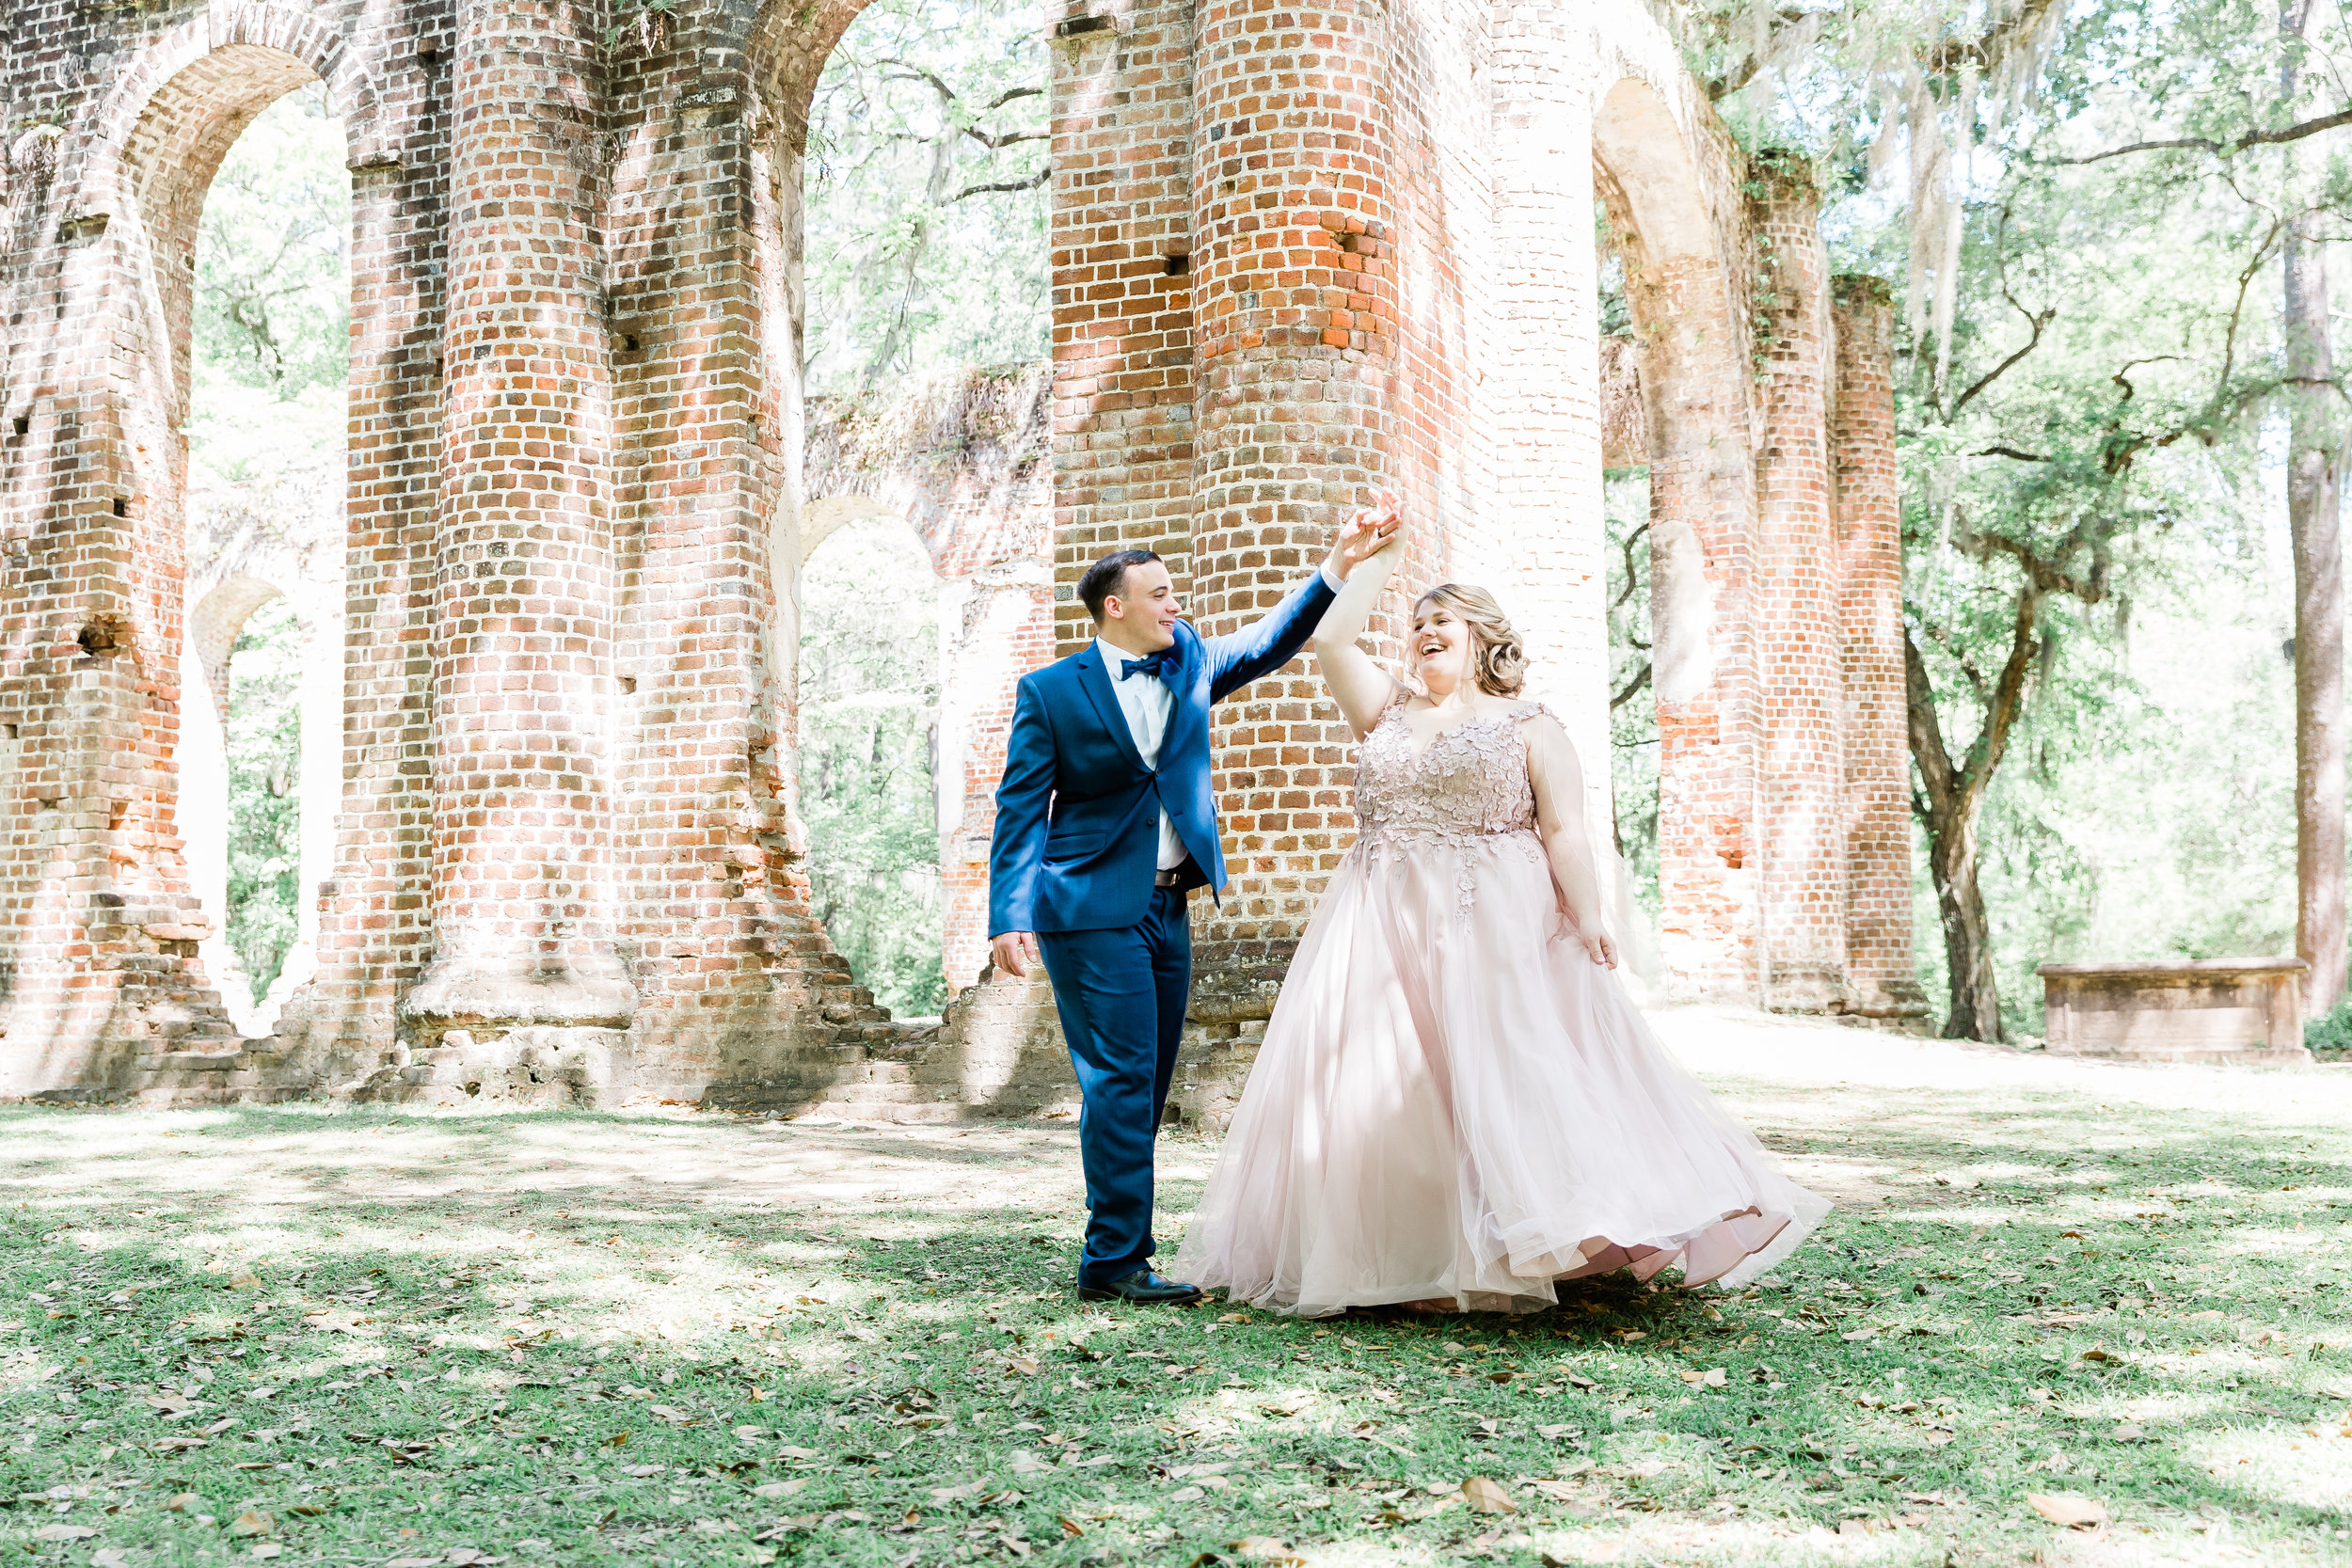 20190417-Southern Lens Photography-savannah family photographer- Ashley and Zack-old sheldon church ruins-201950.jpg